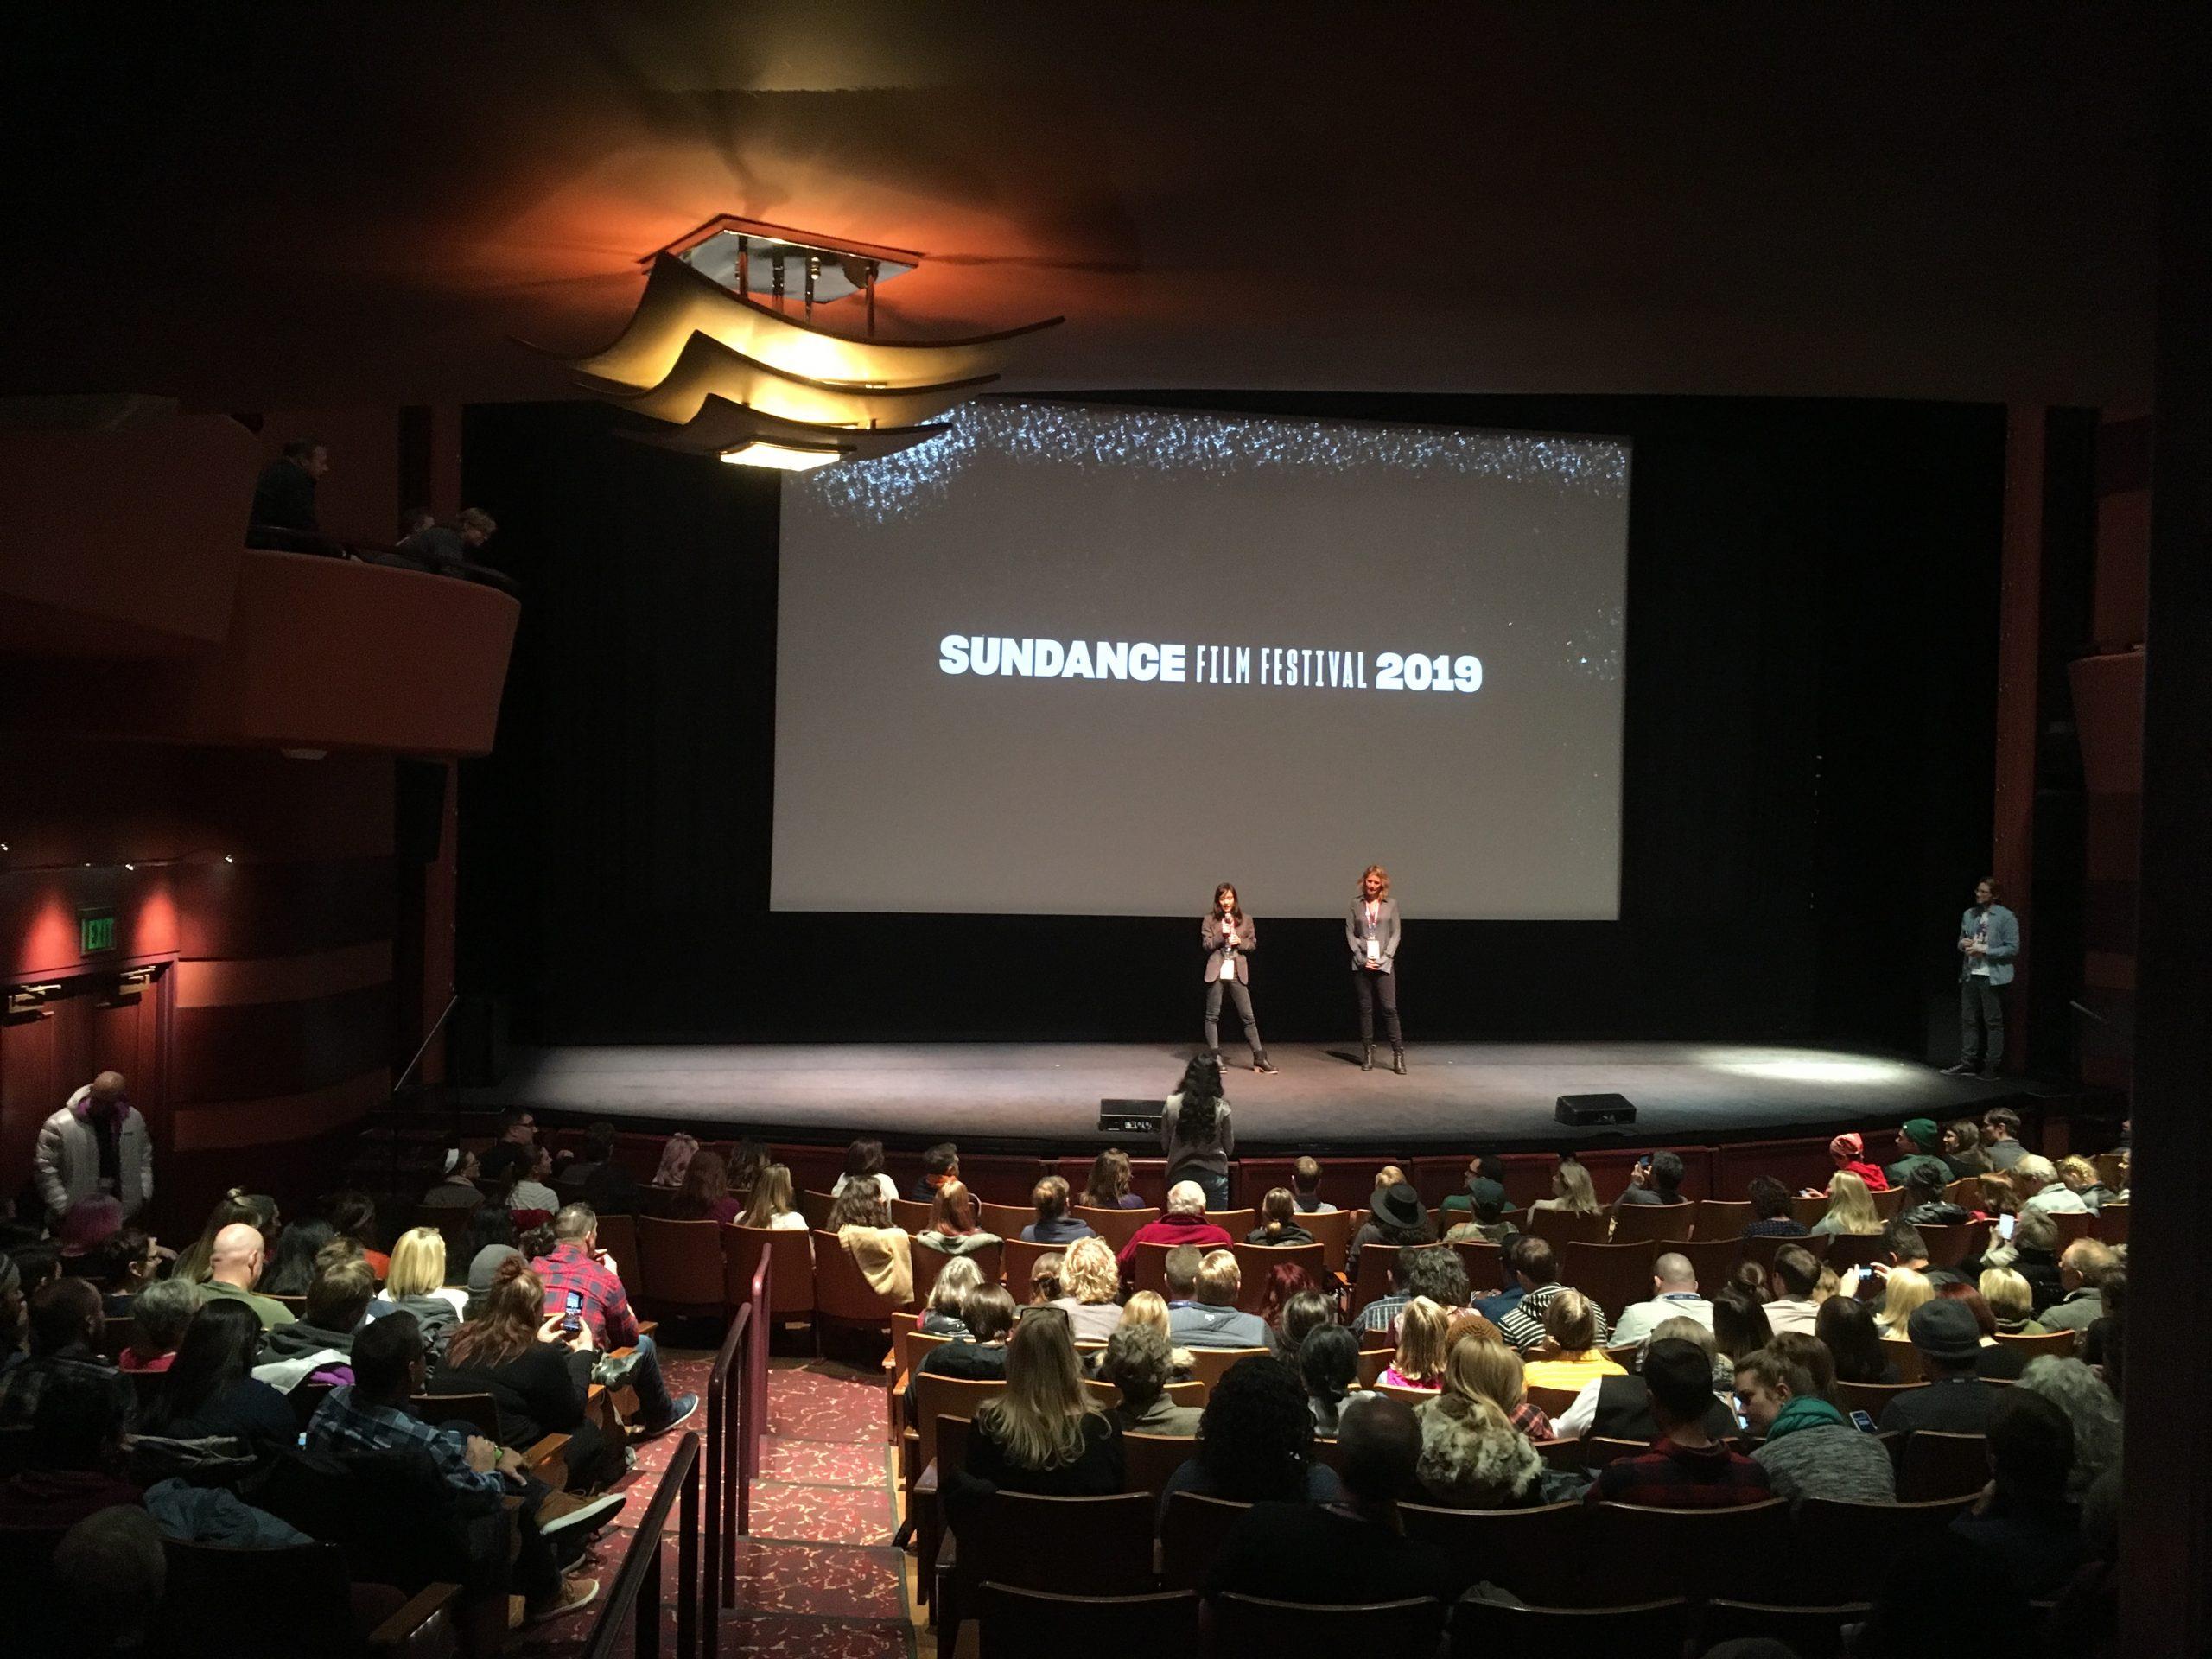 Episode 4. Special Sundance Report.